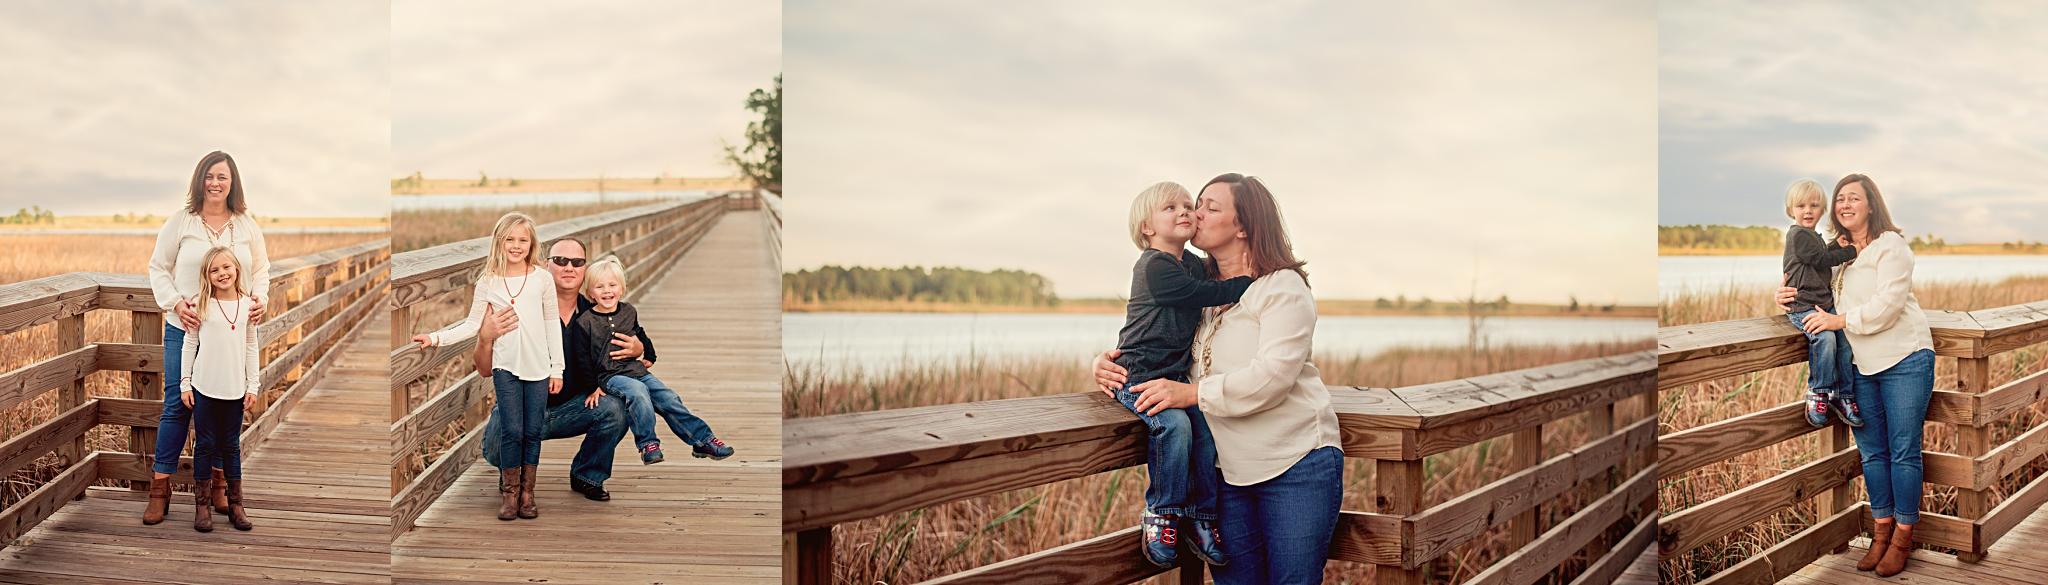 wilmington nc family photos